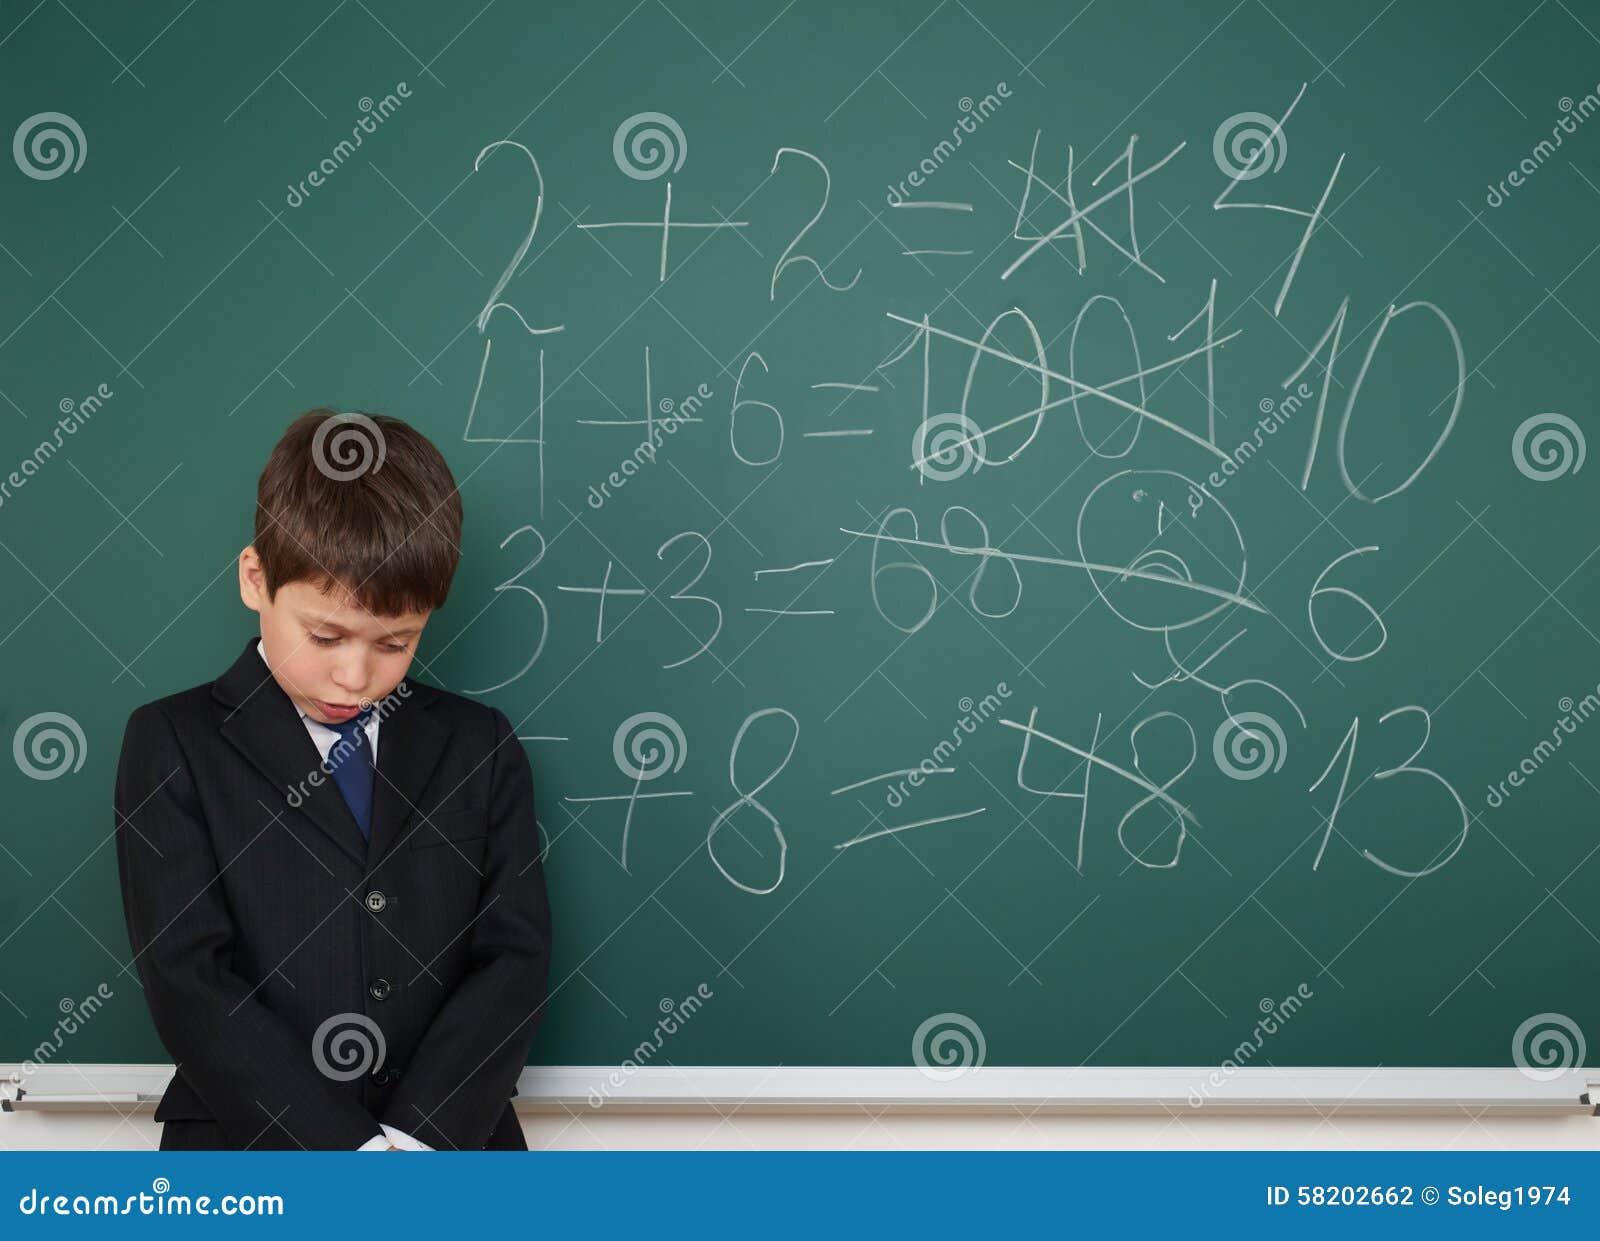 School Boy Solve Math On School Board Stock Photo - Image of ...